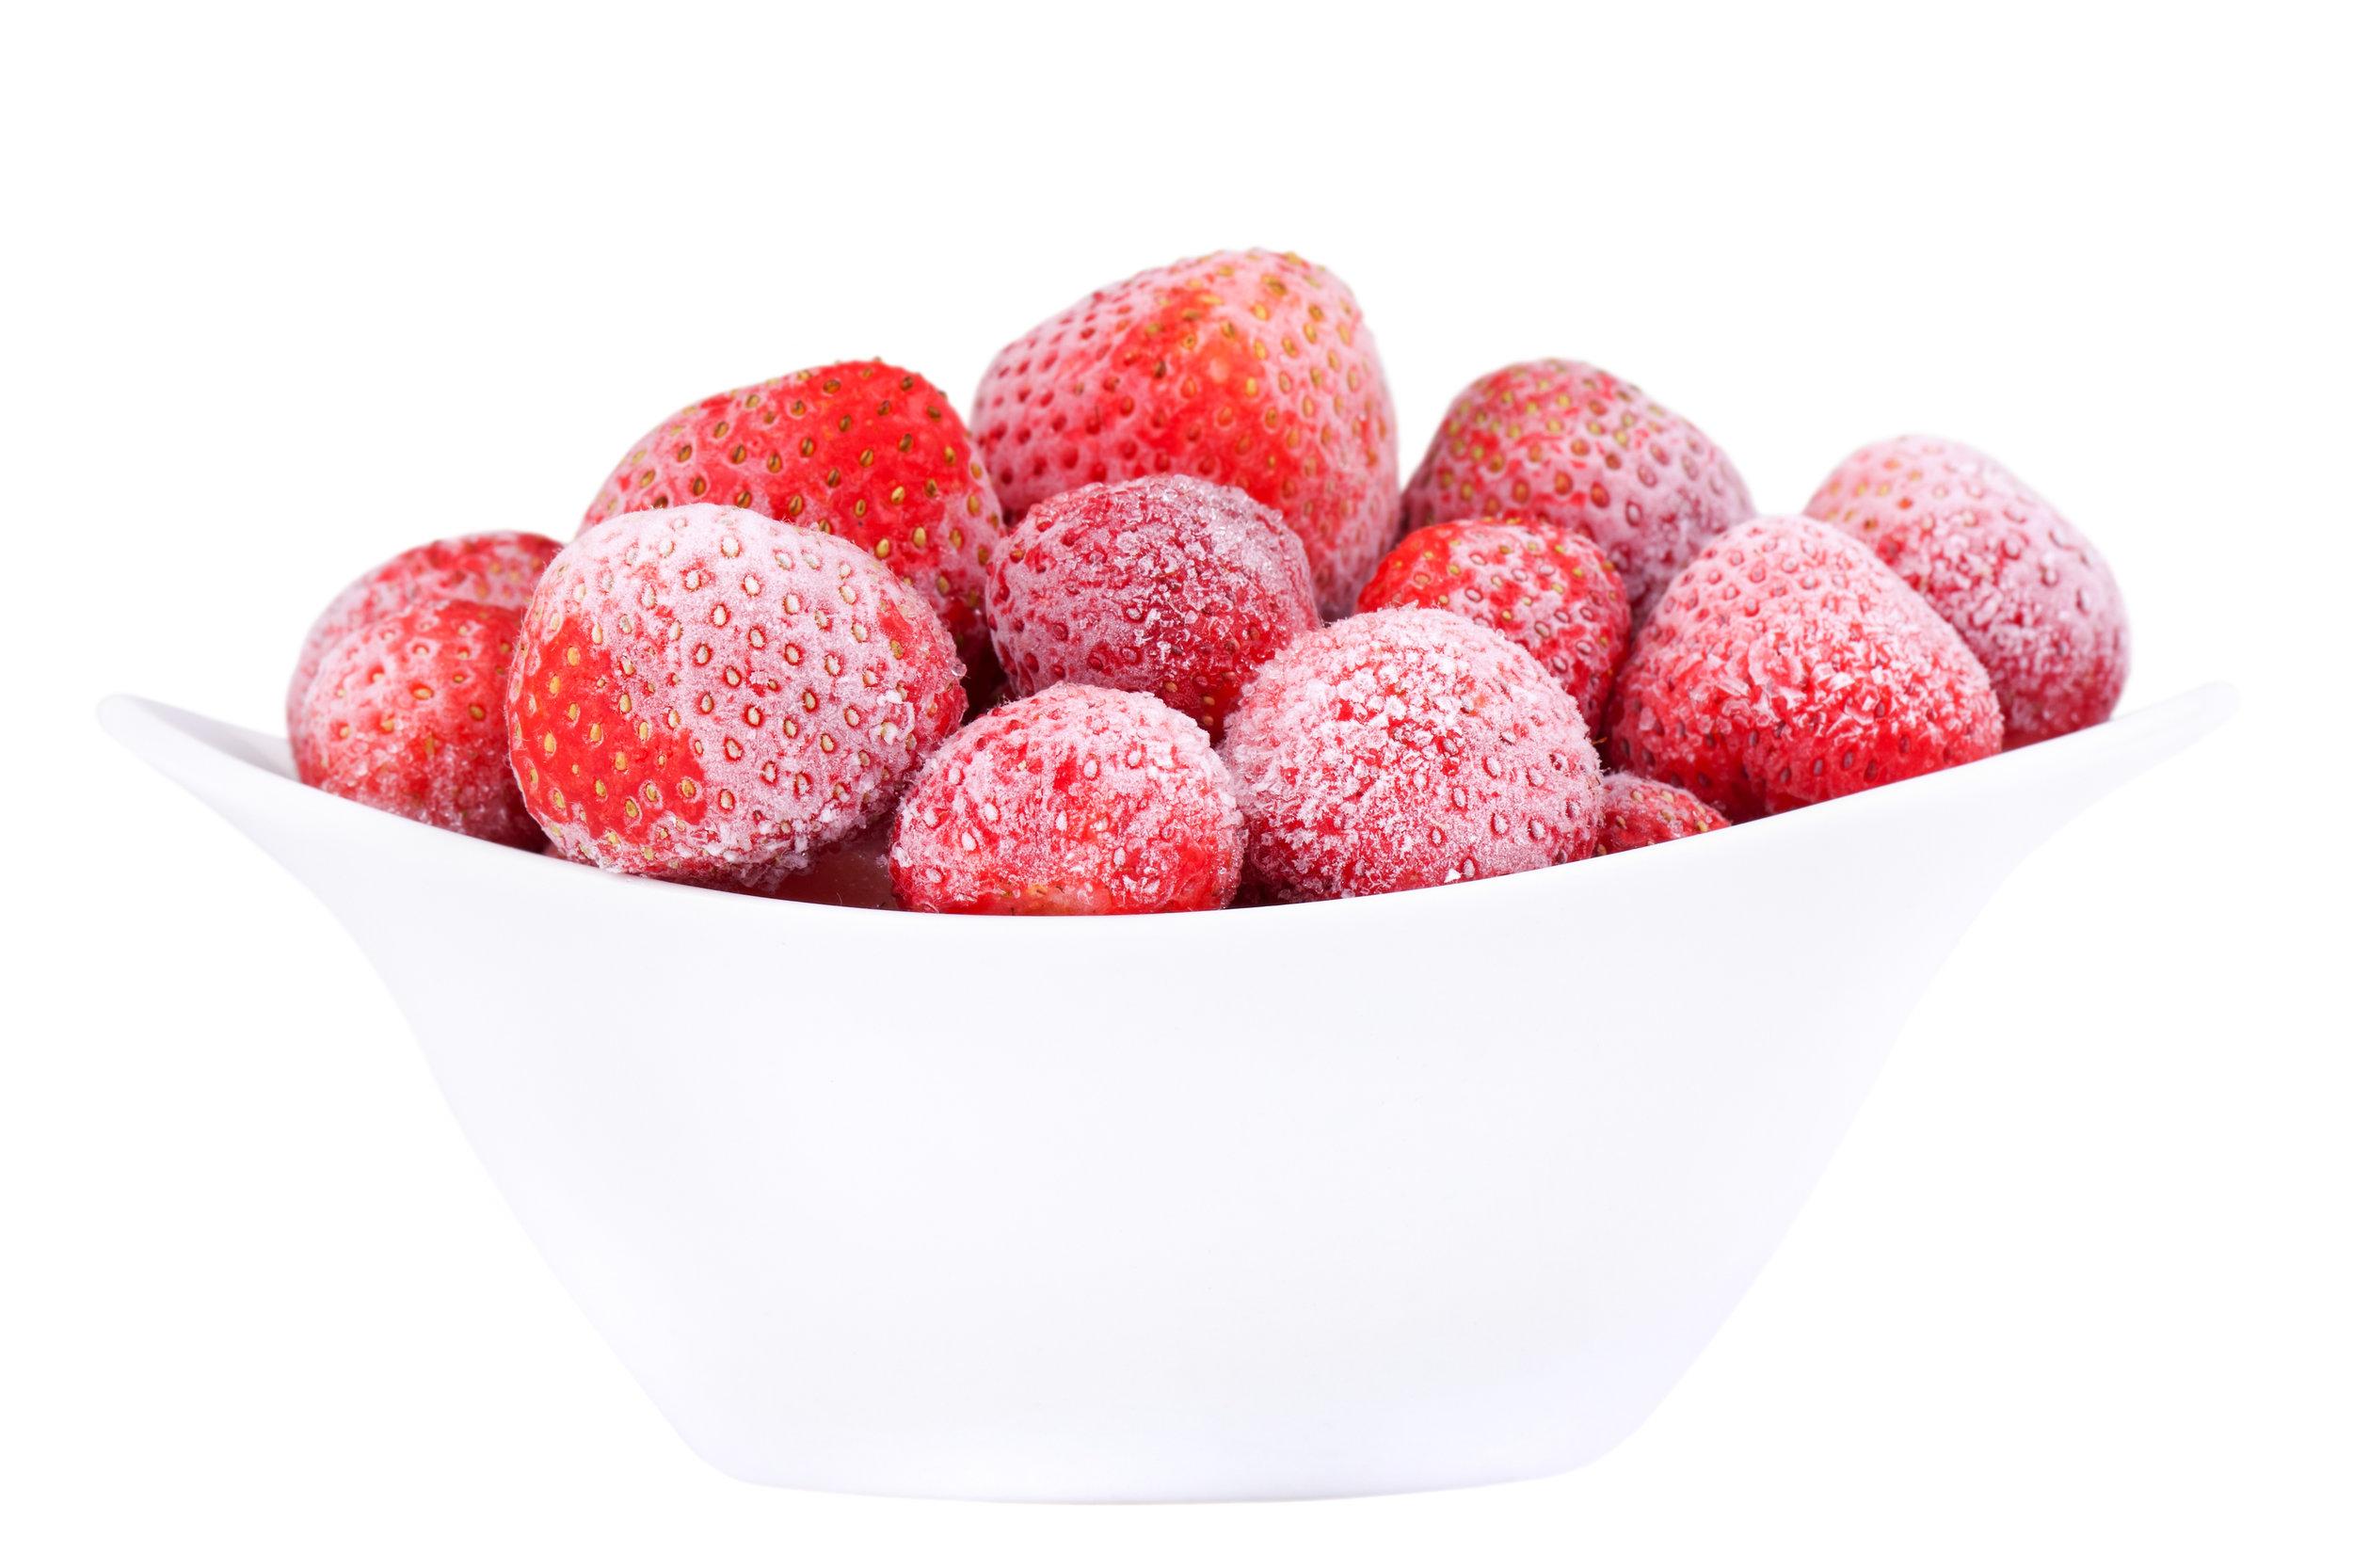 frozen-strawberries-17106232.jpg